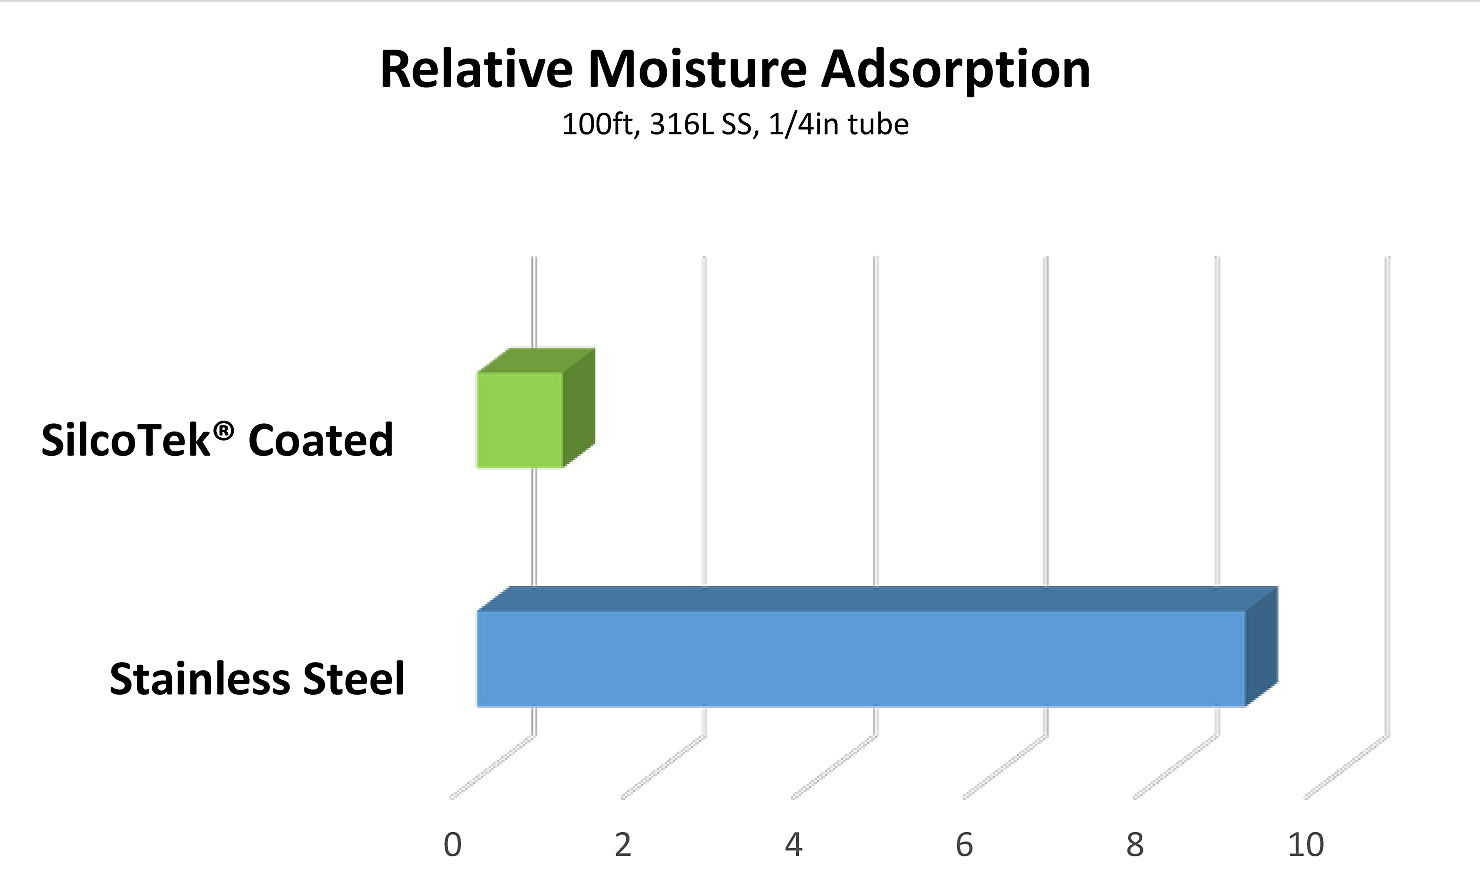 Relative_Moisture_Adsorption_10_5_16.jpg